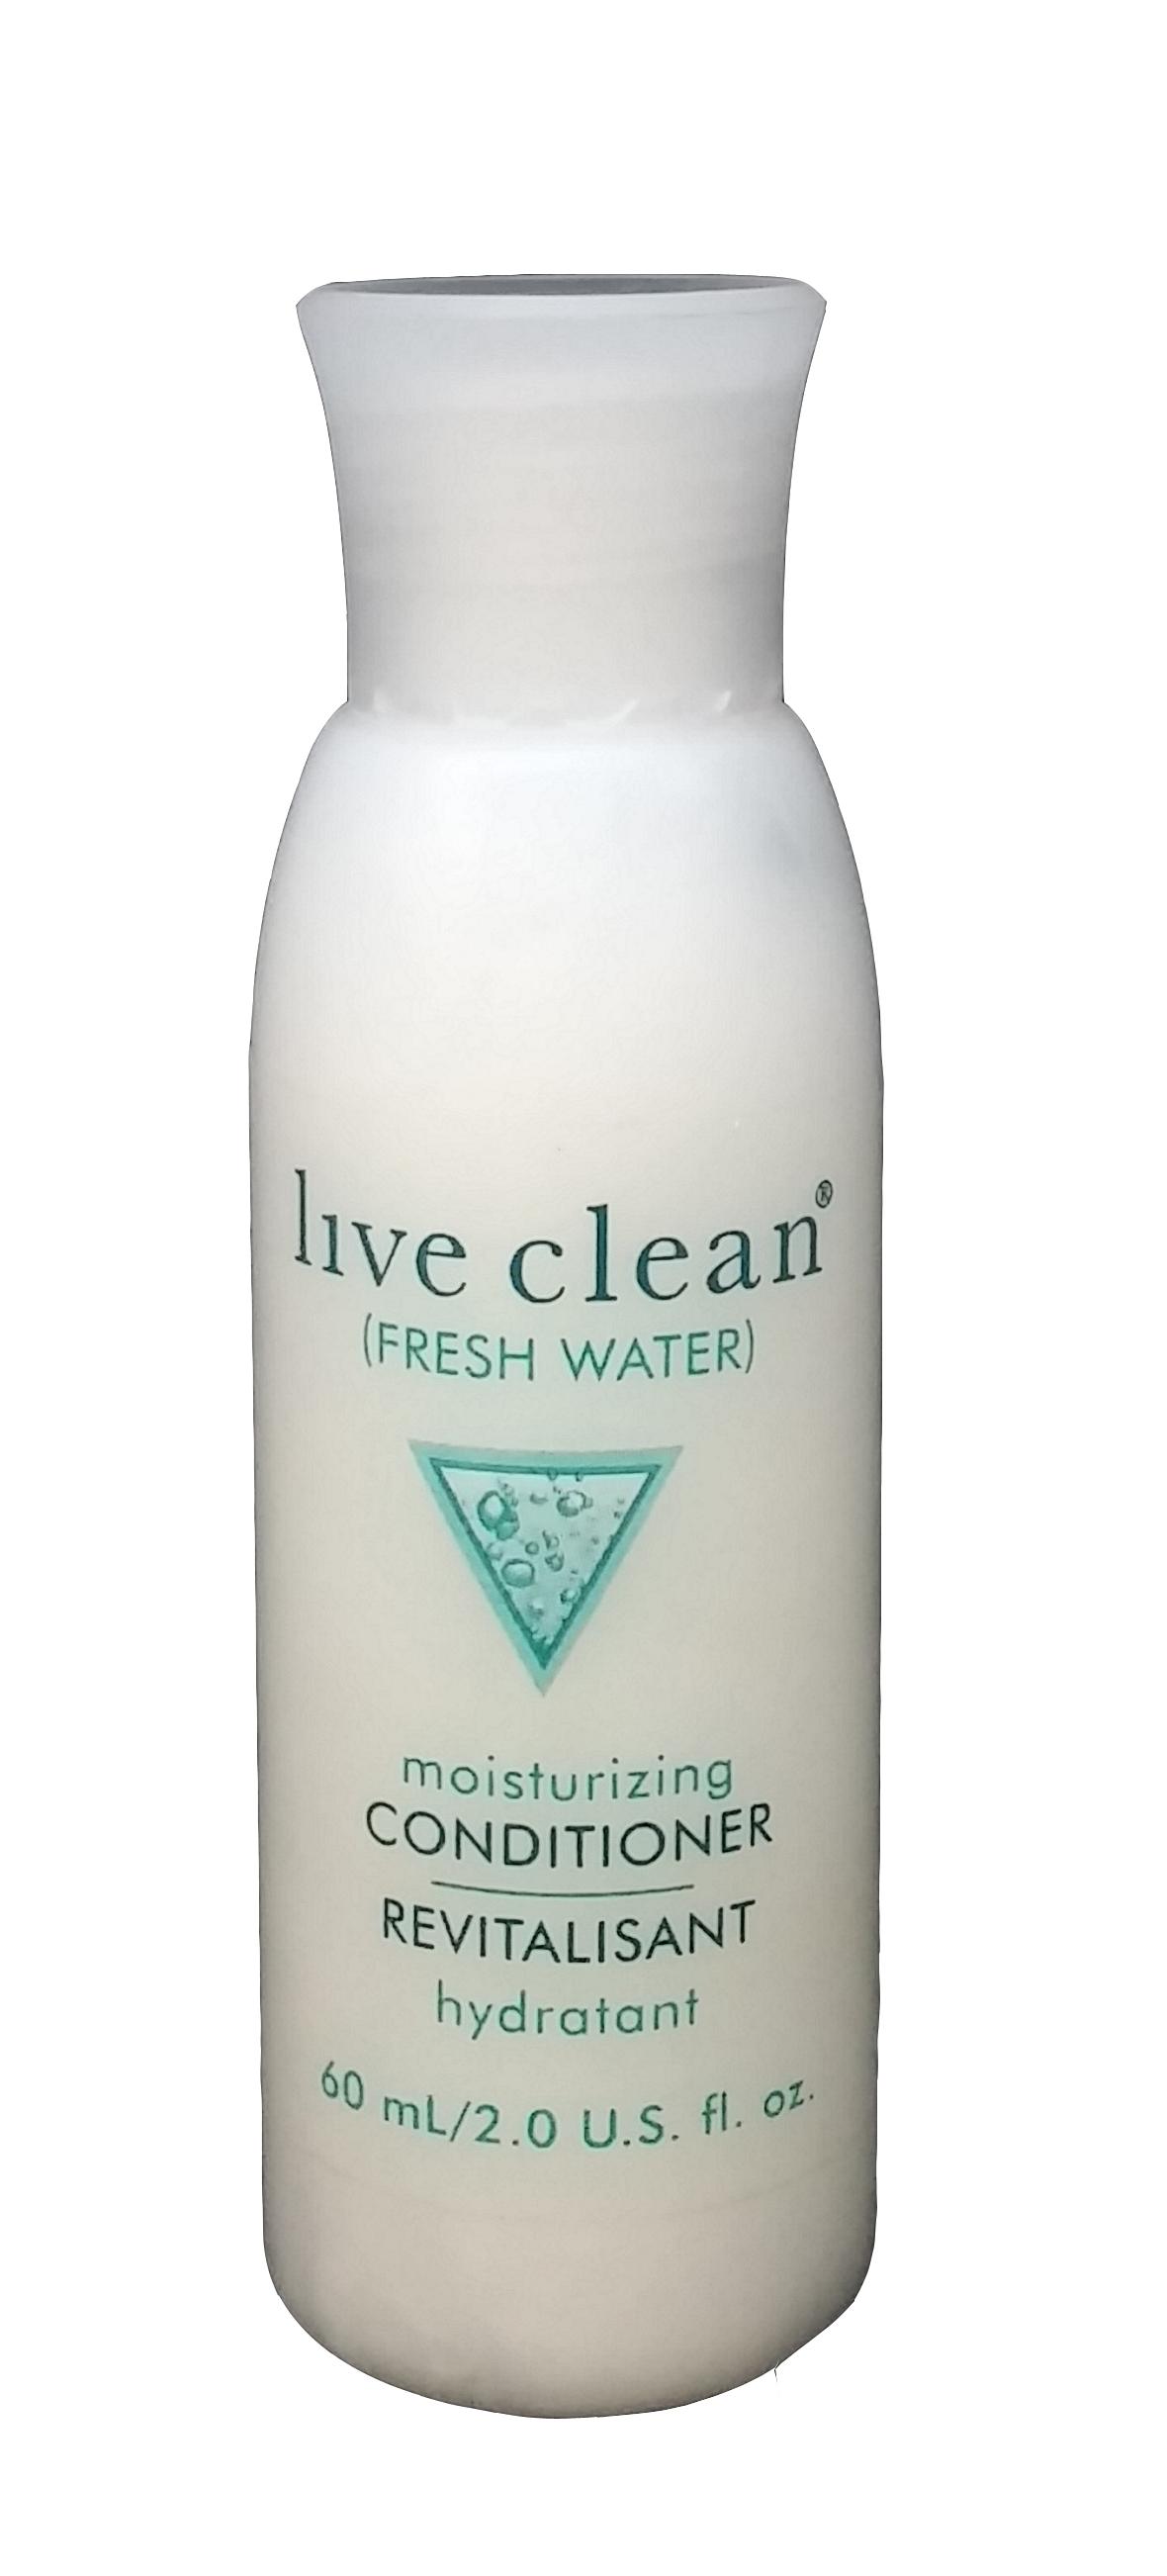 Live Clean Fresh Water Moisturizing Conditioner